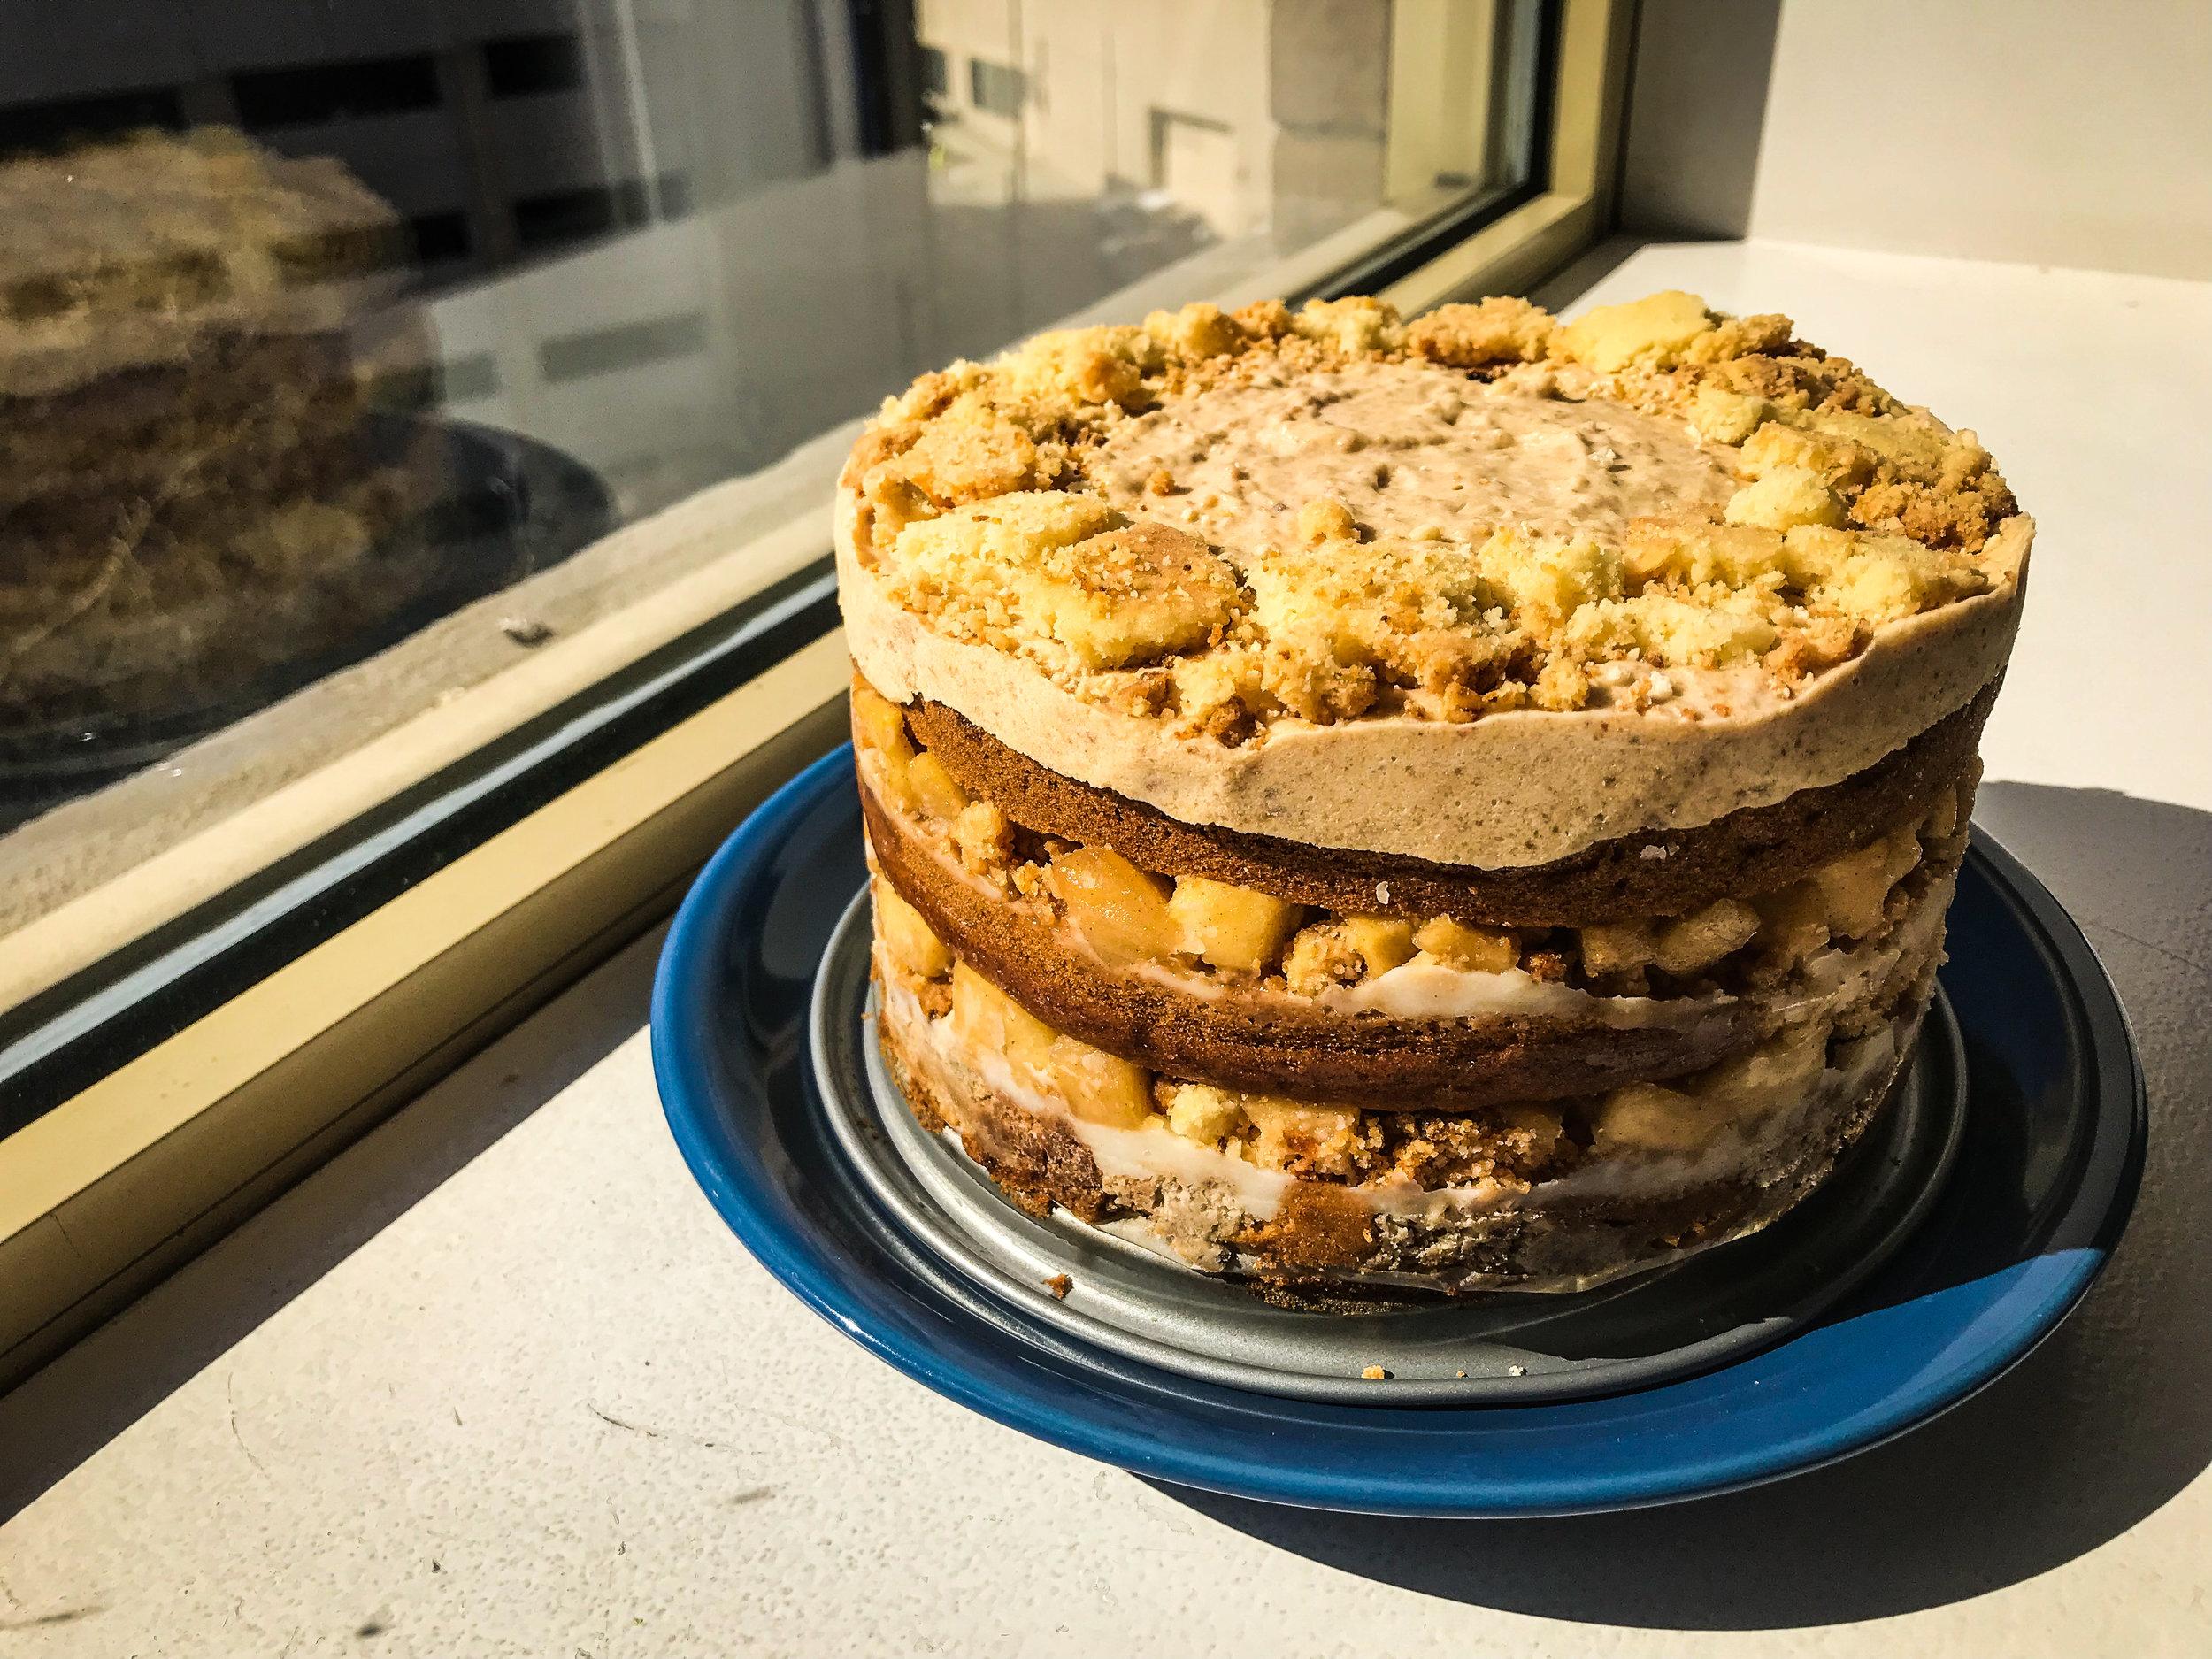 APPLE PIE LAYER CAKE - #SIAintheKitchen